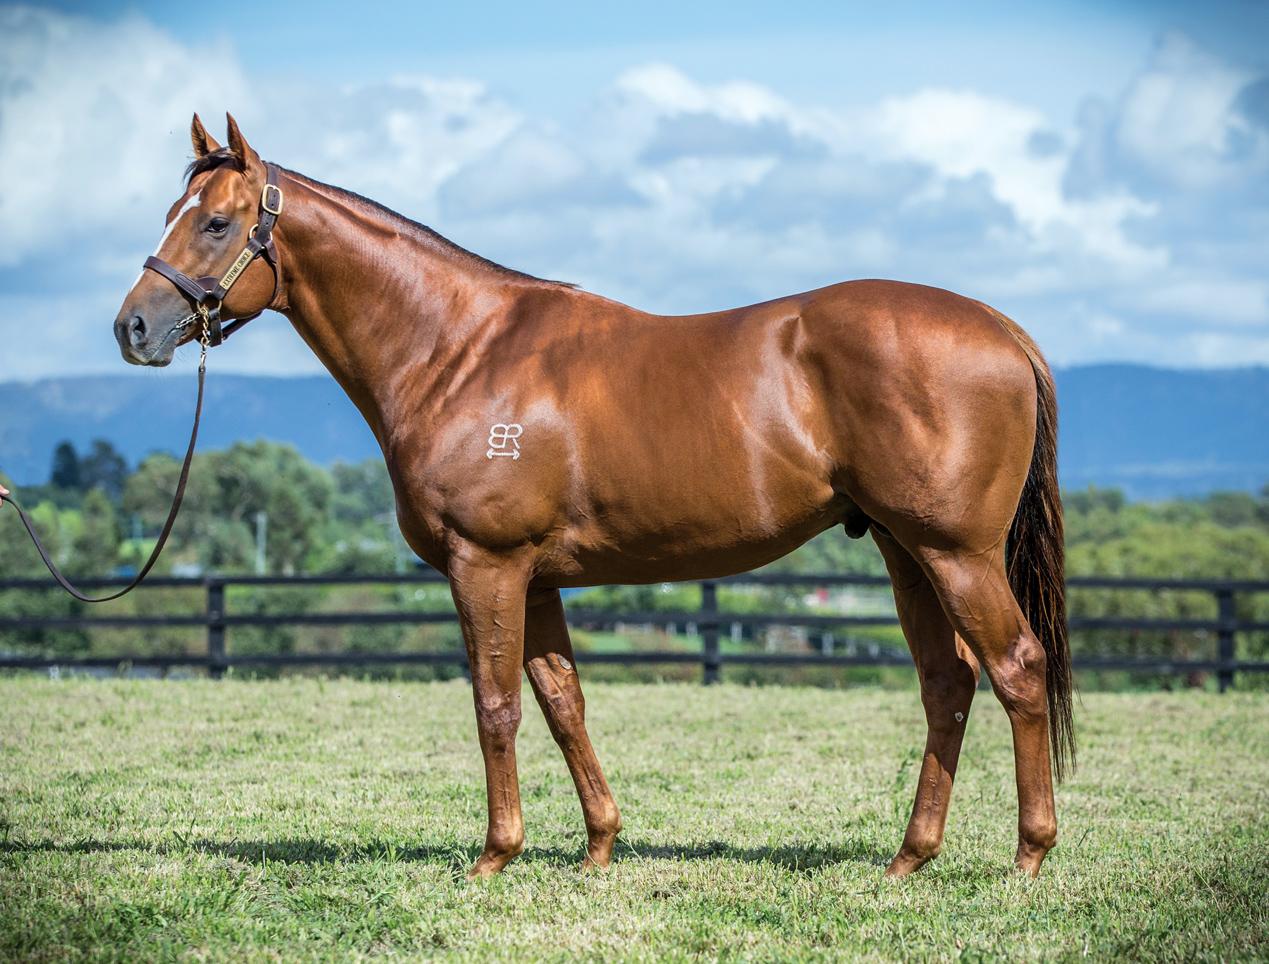 https://www.stallions.com.au/wp-content/uploads/2019/09/104305519.jpg